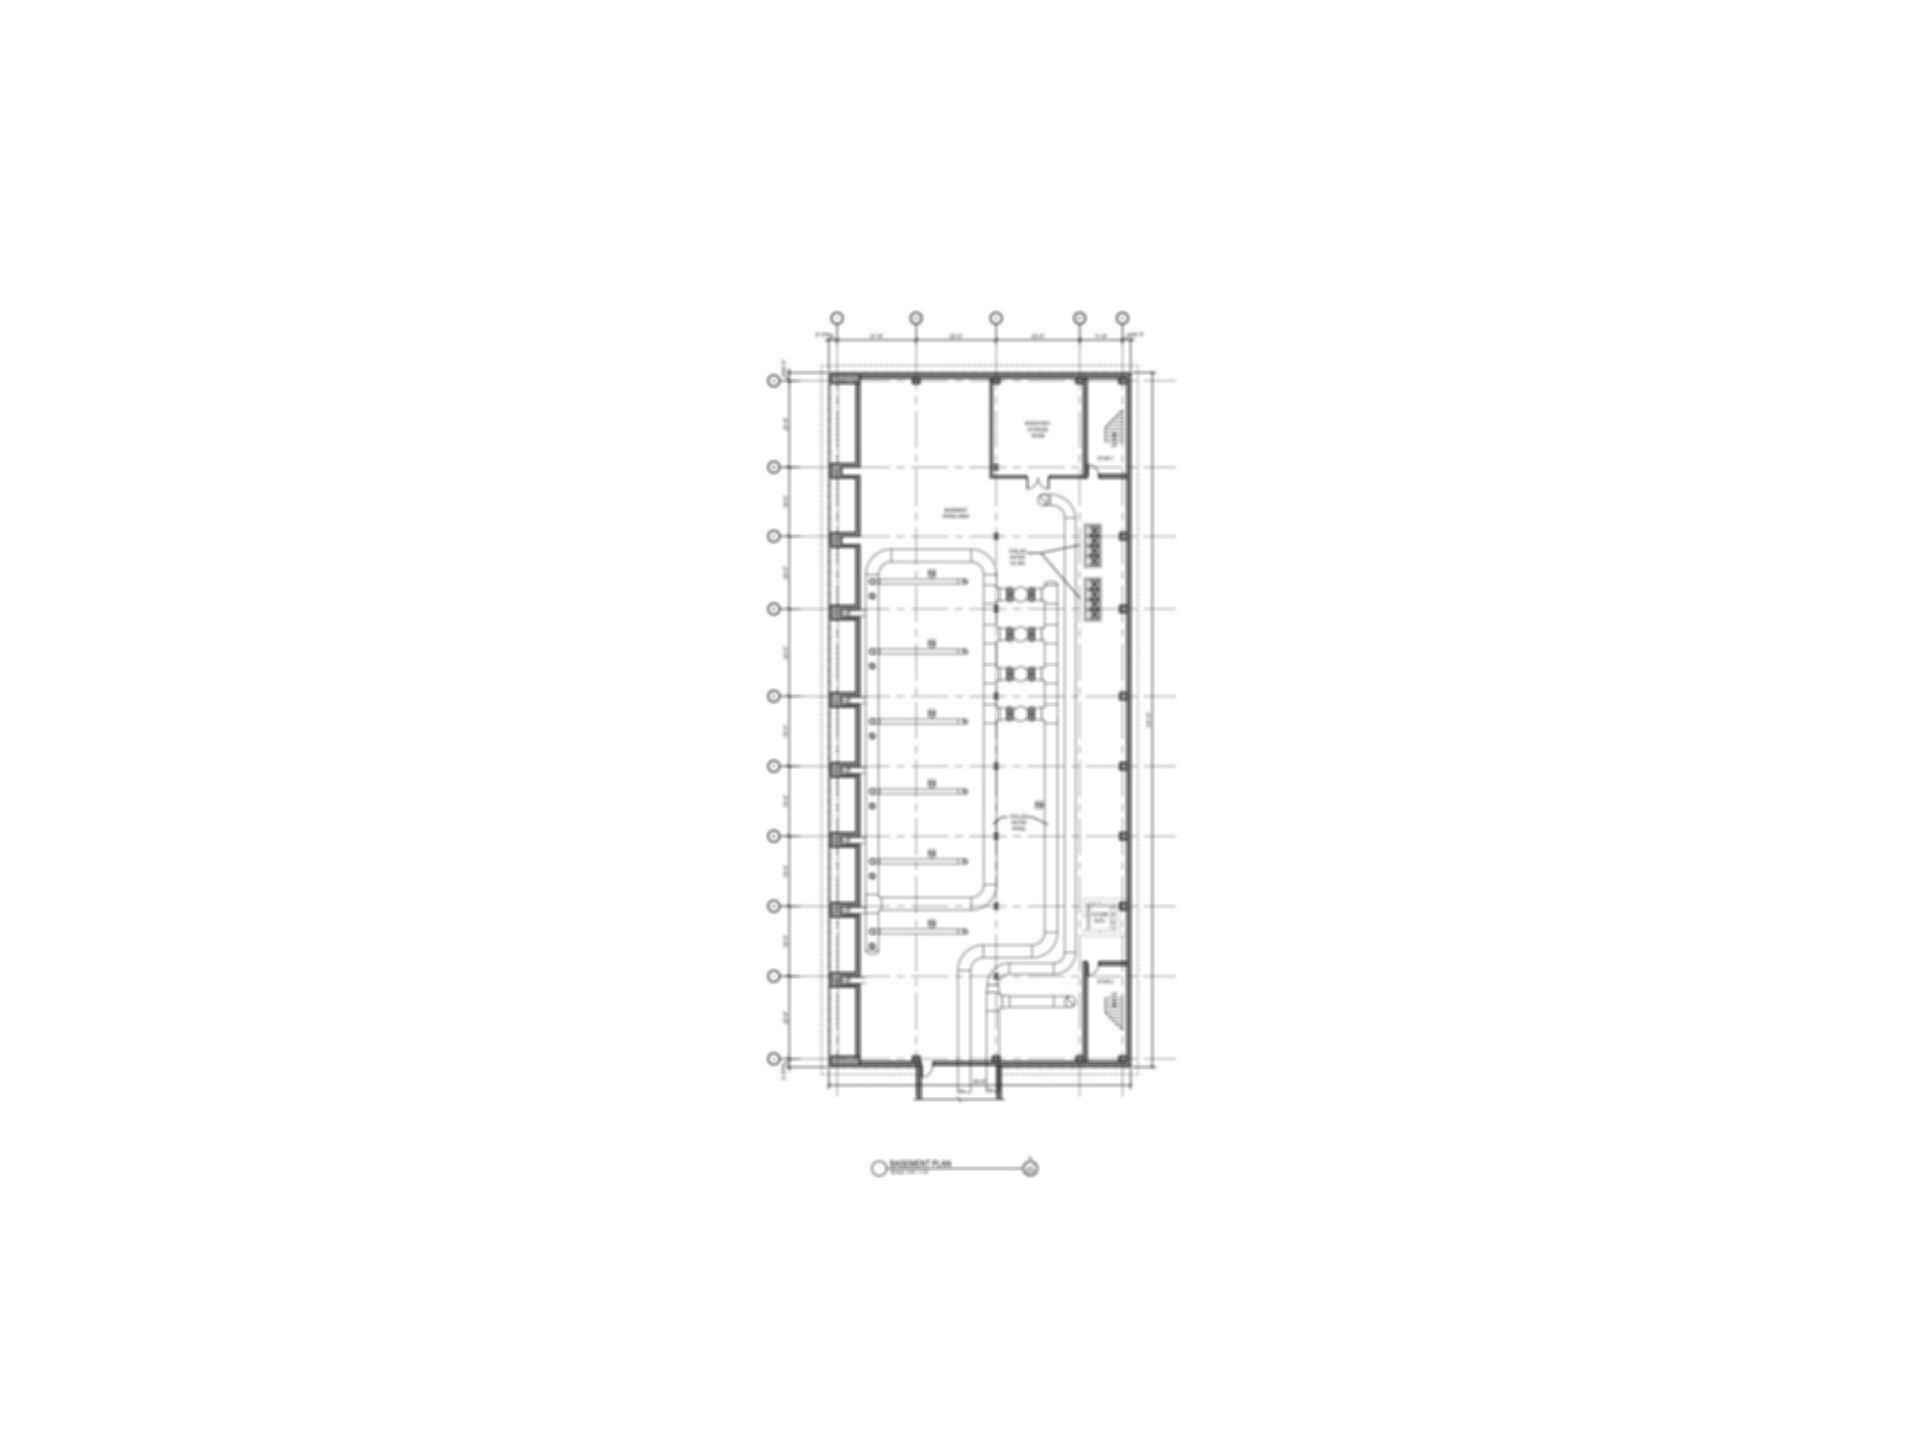 South Campus Chiller Plant - Site Plan